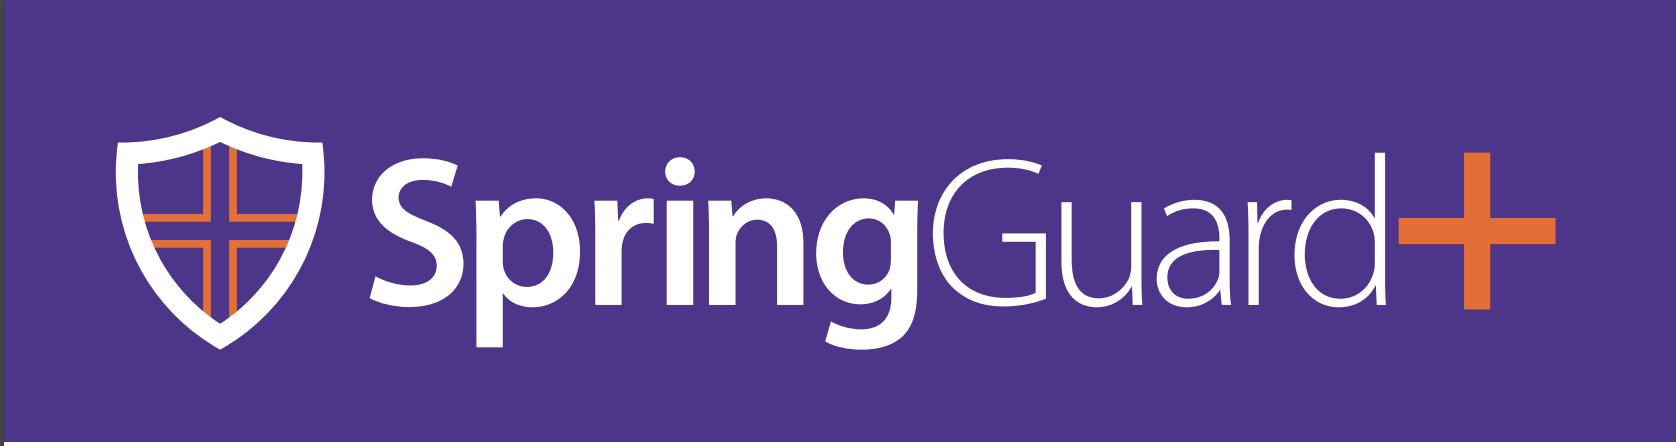 Springguard.png